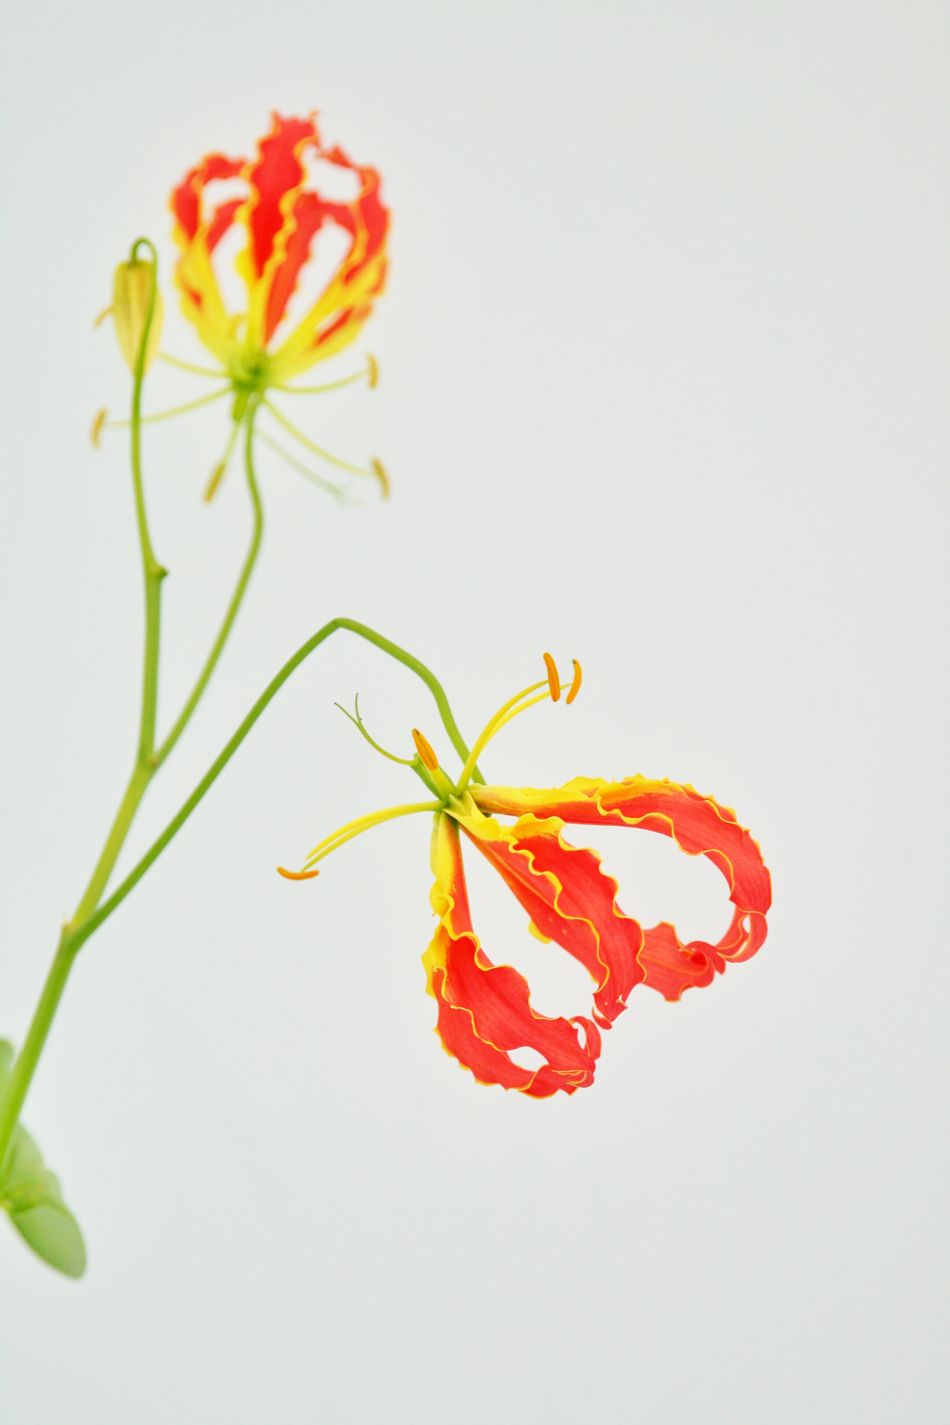 Hong kong flower show 2016 EyeEm Flower Hong Kong Flowers In Bloom EyeEm HongKong Eyeem Philippines Flowers, Nature And Beauty Flower Photography HK Flower Show Flowers HongKong Flower Show Flowerstagram HkFlowerShow Flower